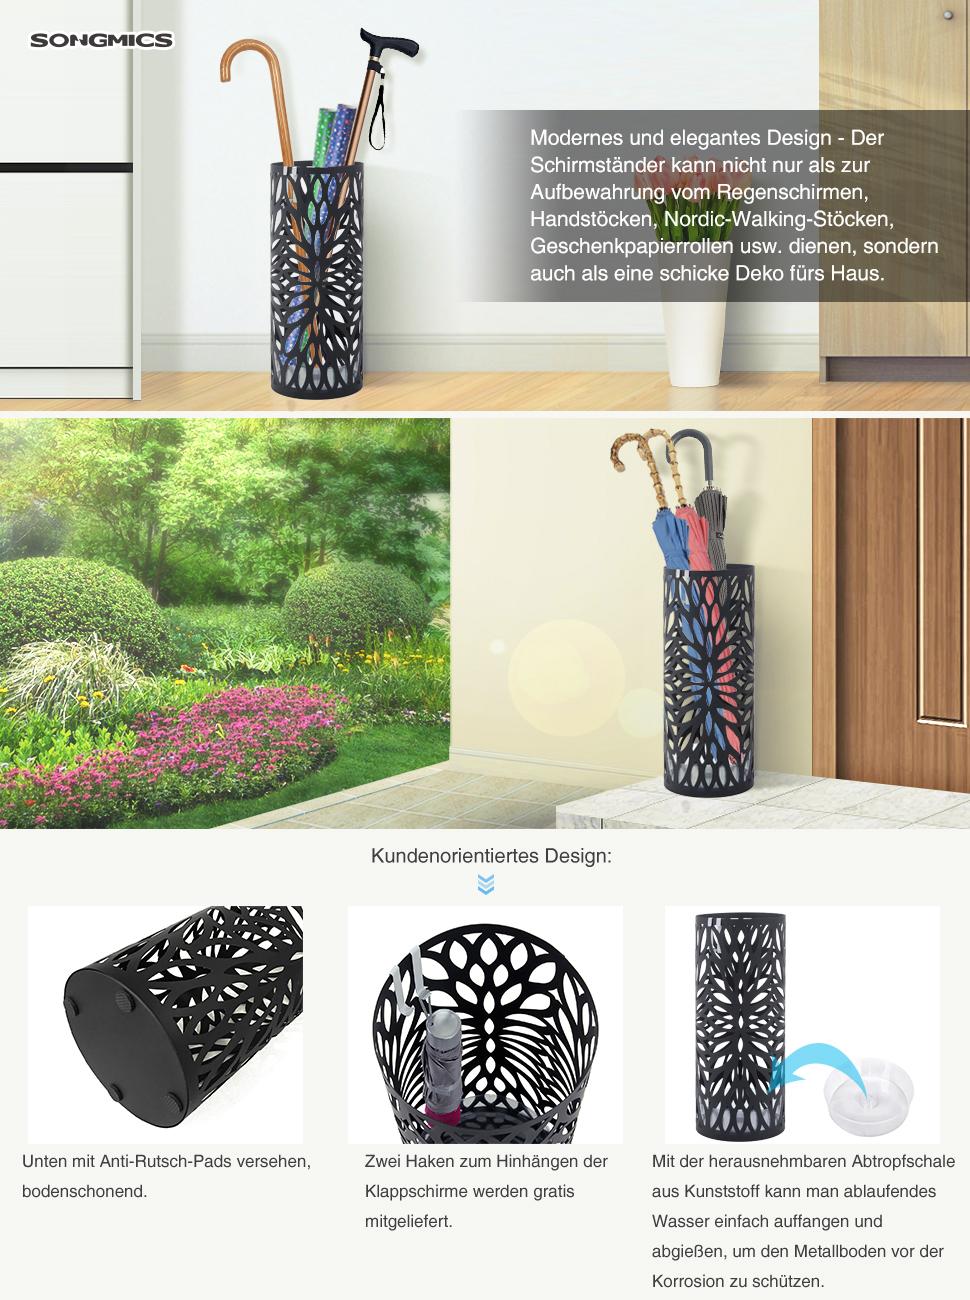 Ideen fur regenschirmstander innendesign bestimmt auswahl  Amazon.de: SONGMICS Regenschirmständer Schirmständer mit ...